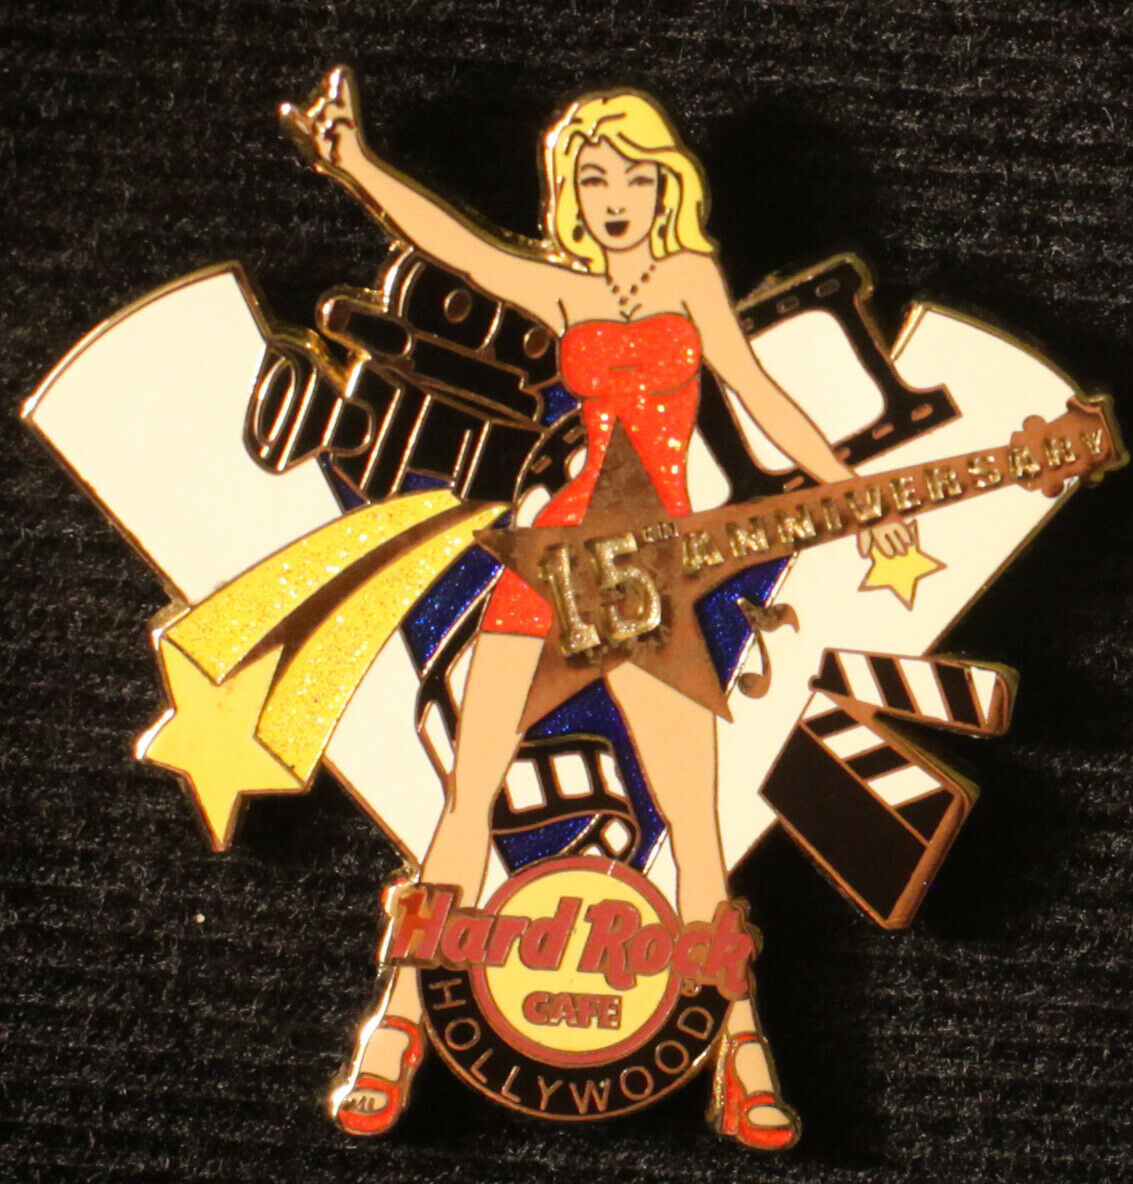 Hard Rock Cafe Pin HOLLYWOOD 15th Anniversary Movie Star Guitar Girl Film Camera - $9.99